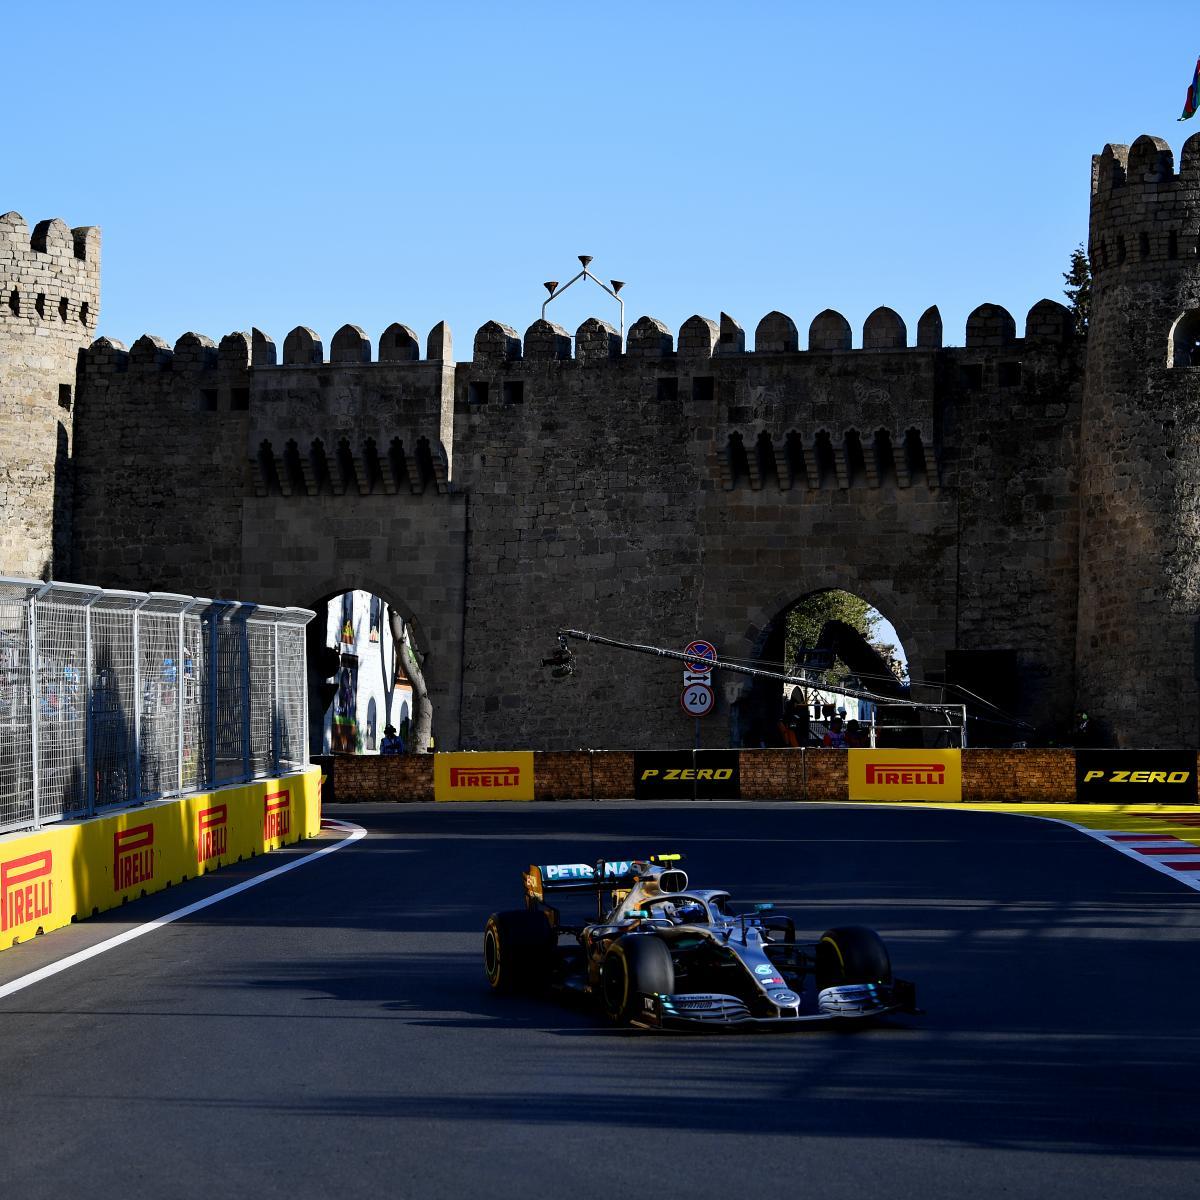 Azerbaijan F1 Grand Prix 2019 Results: Valtteri Bottas